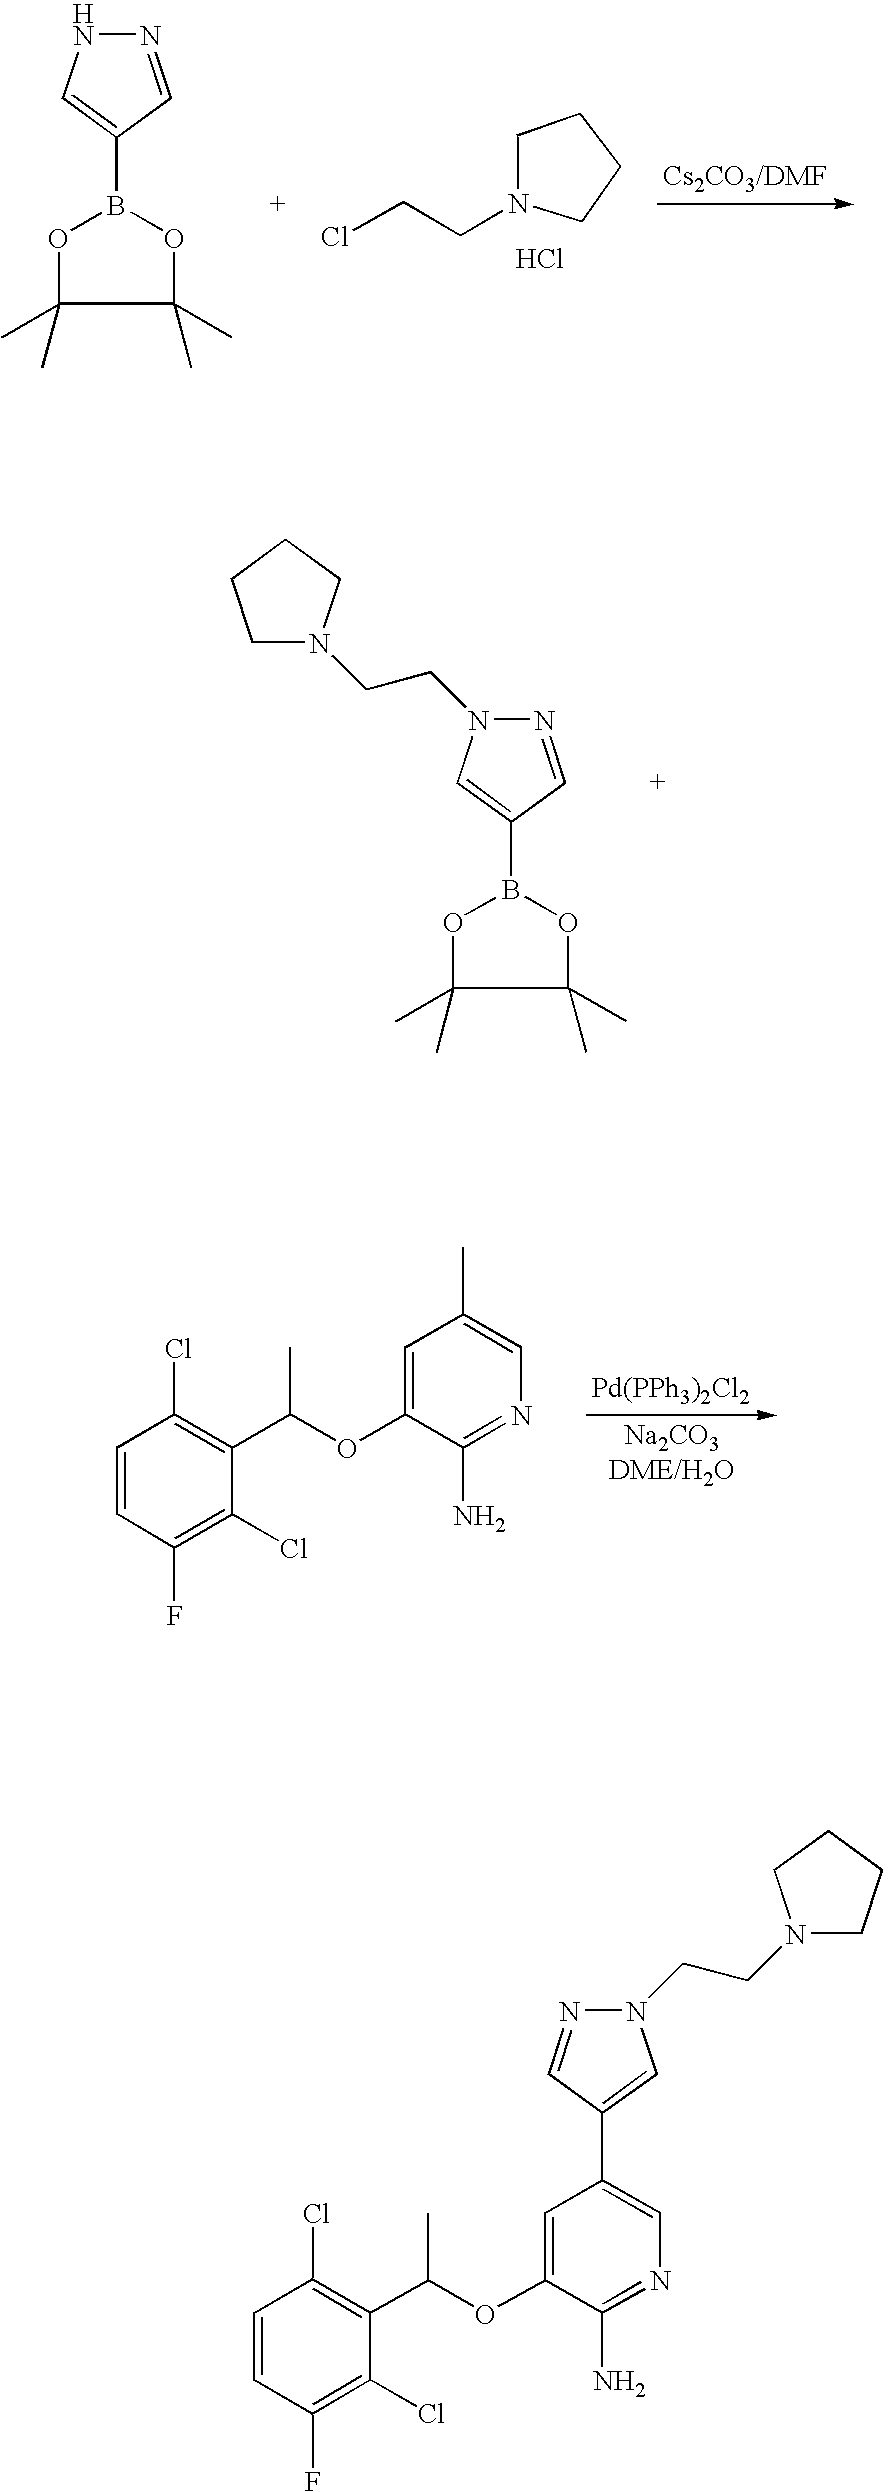 Us7230098b2 Aminoheteroaryl Compounds As Protein Kinase Inhibitors Wiring Diagram Bolens G194 Figure Us07230098 20070612 C00032